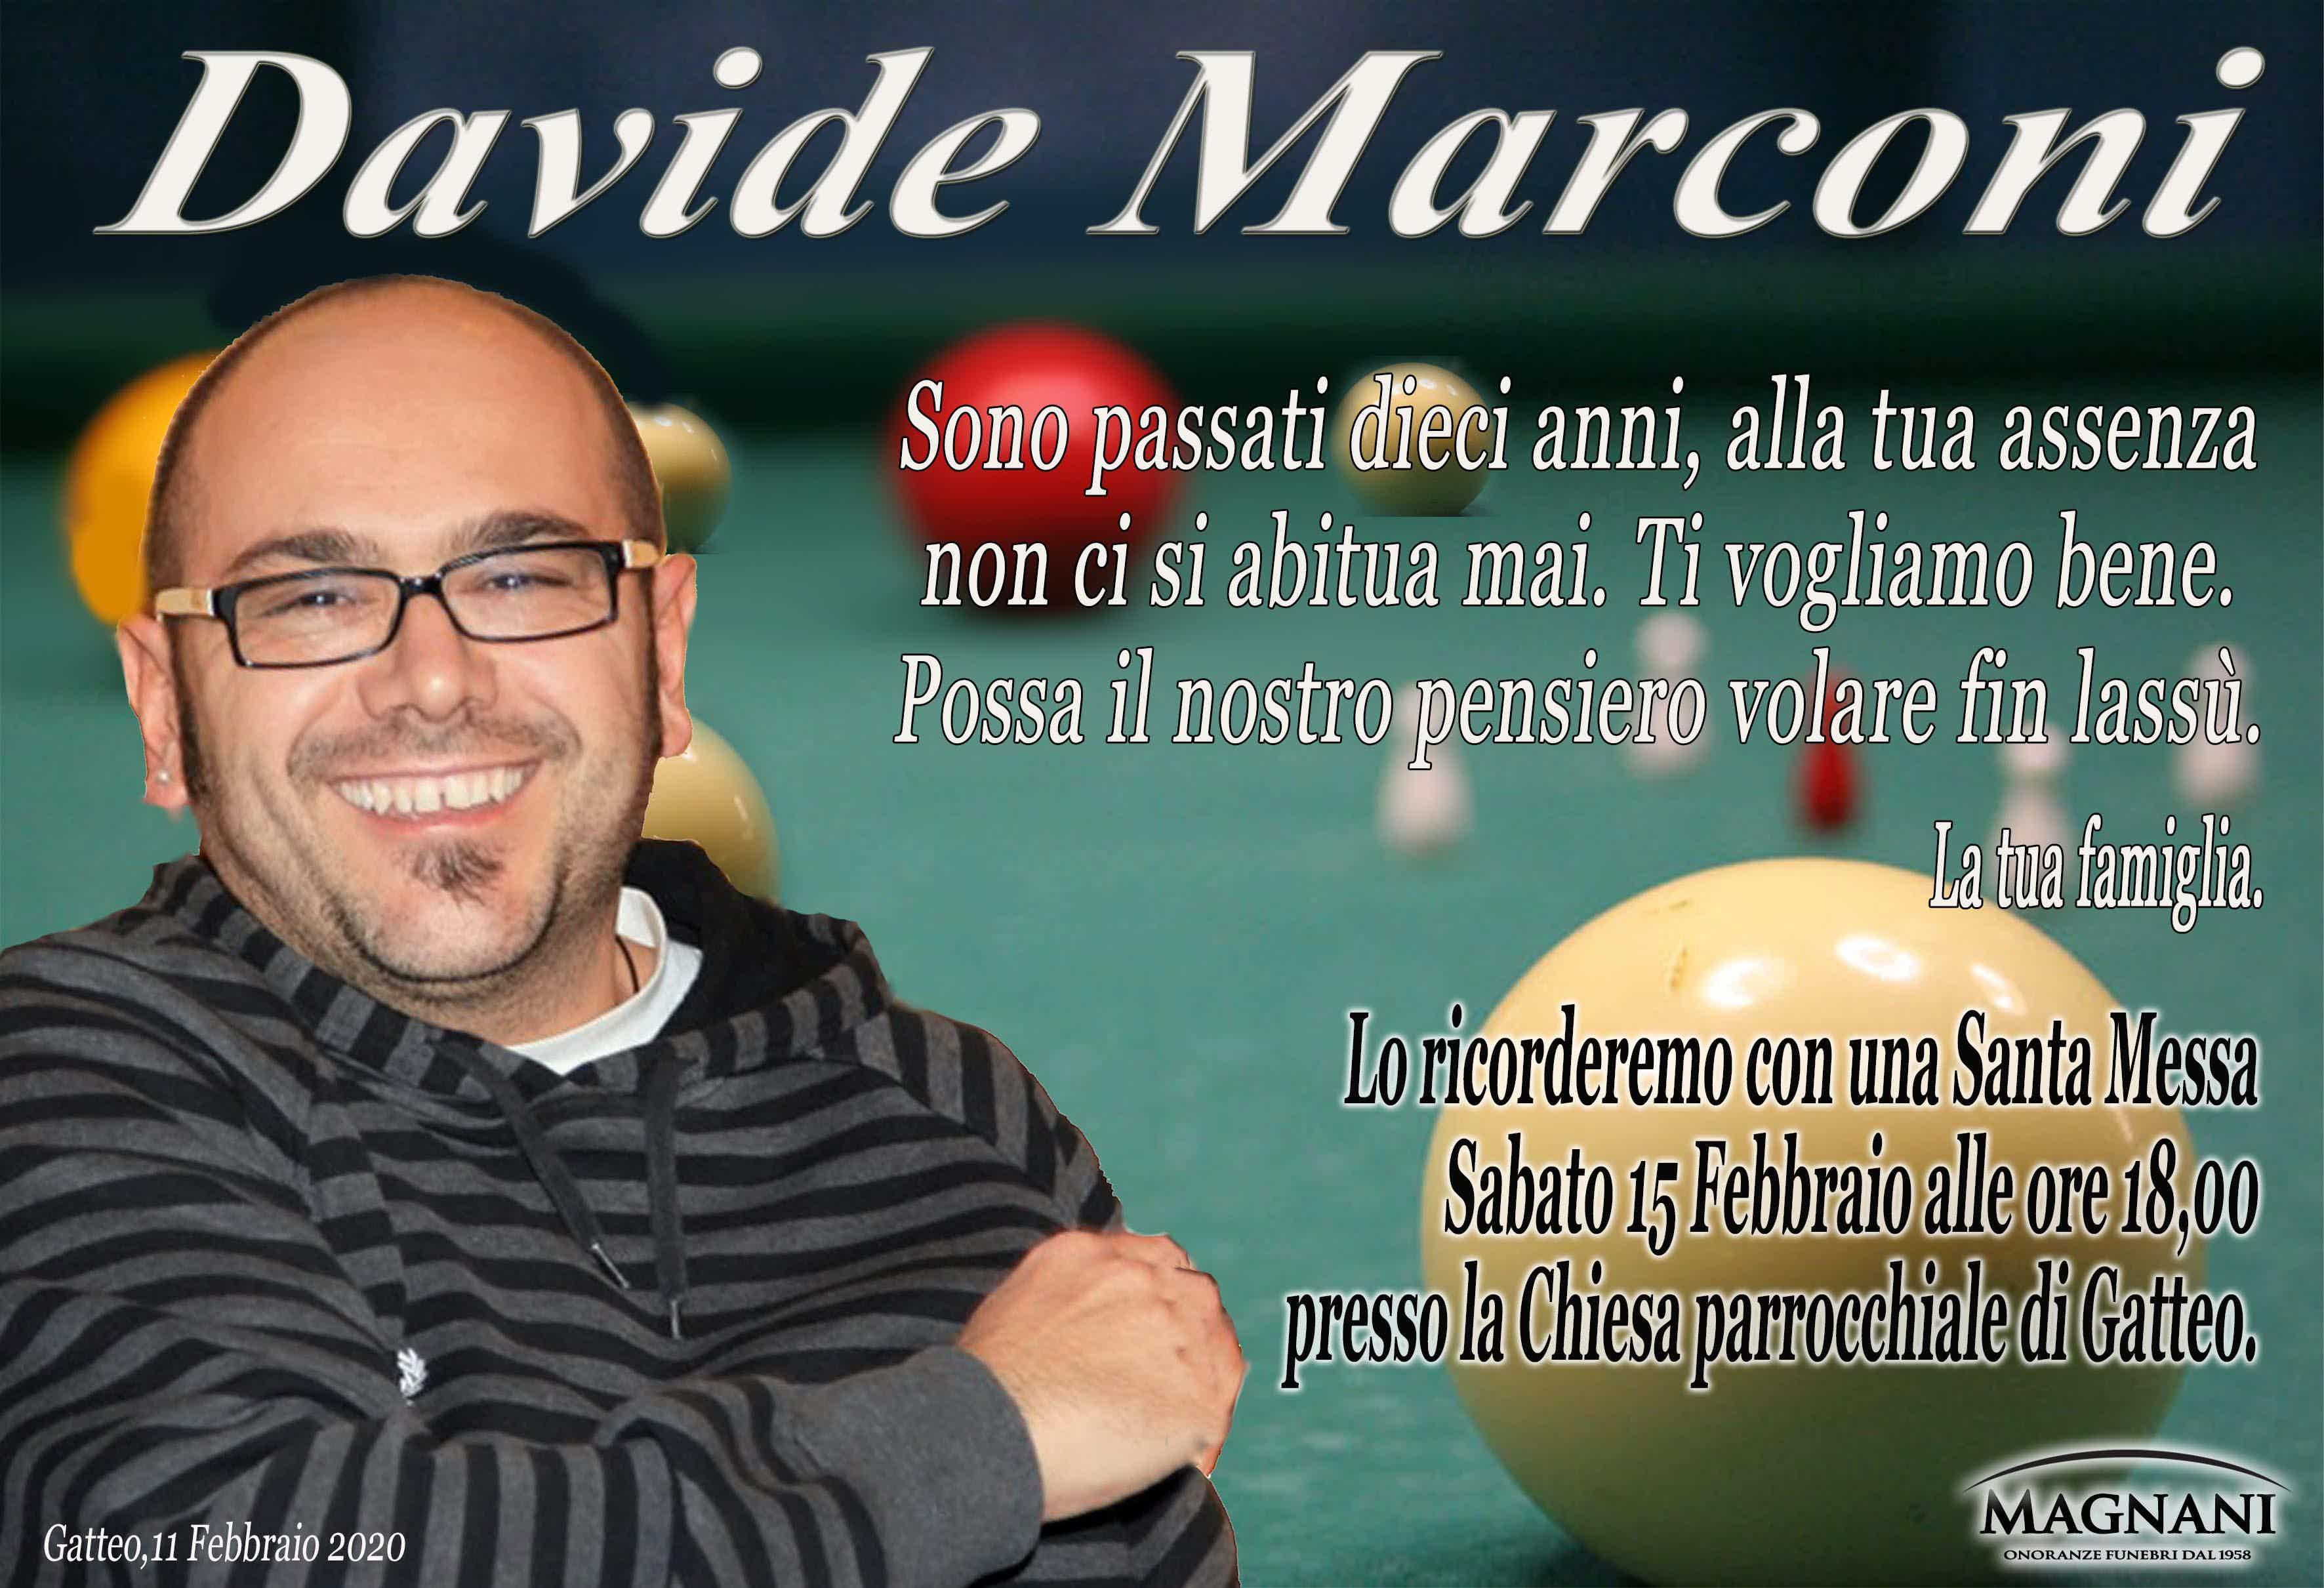 Davide Marconi (ACE)